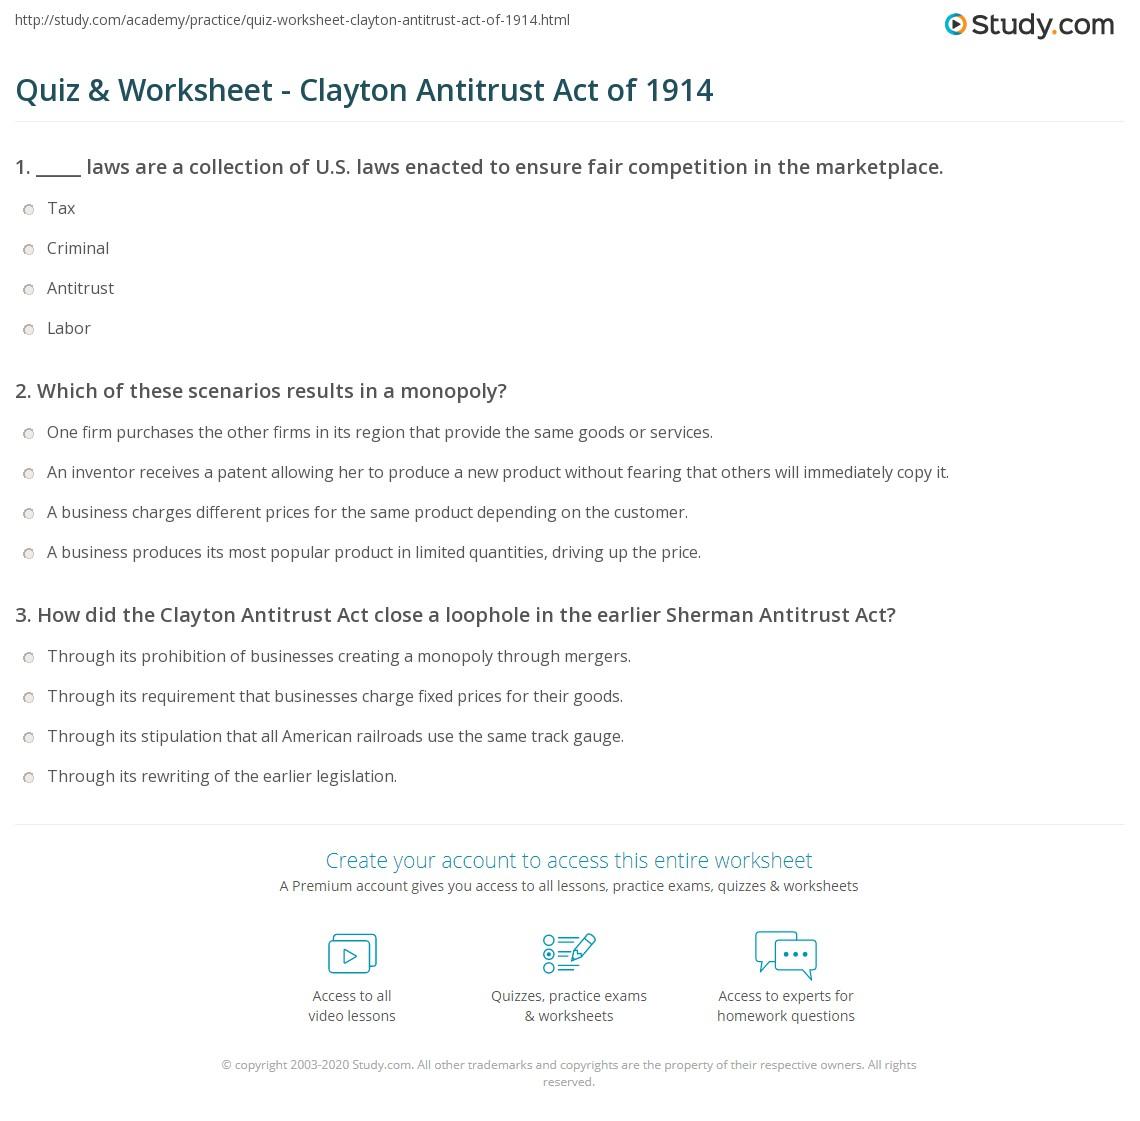 Quiz & Worksheet - Clayton Antitrust Act of 1914 | Study.com